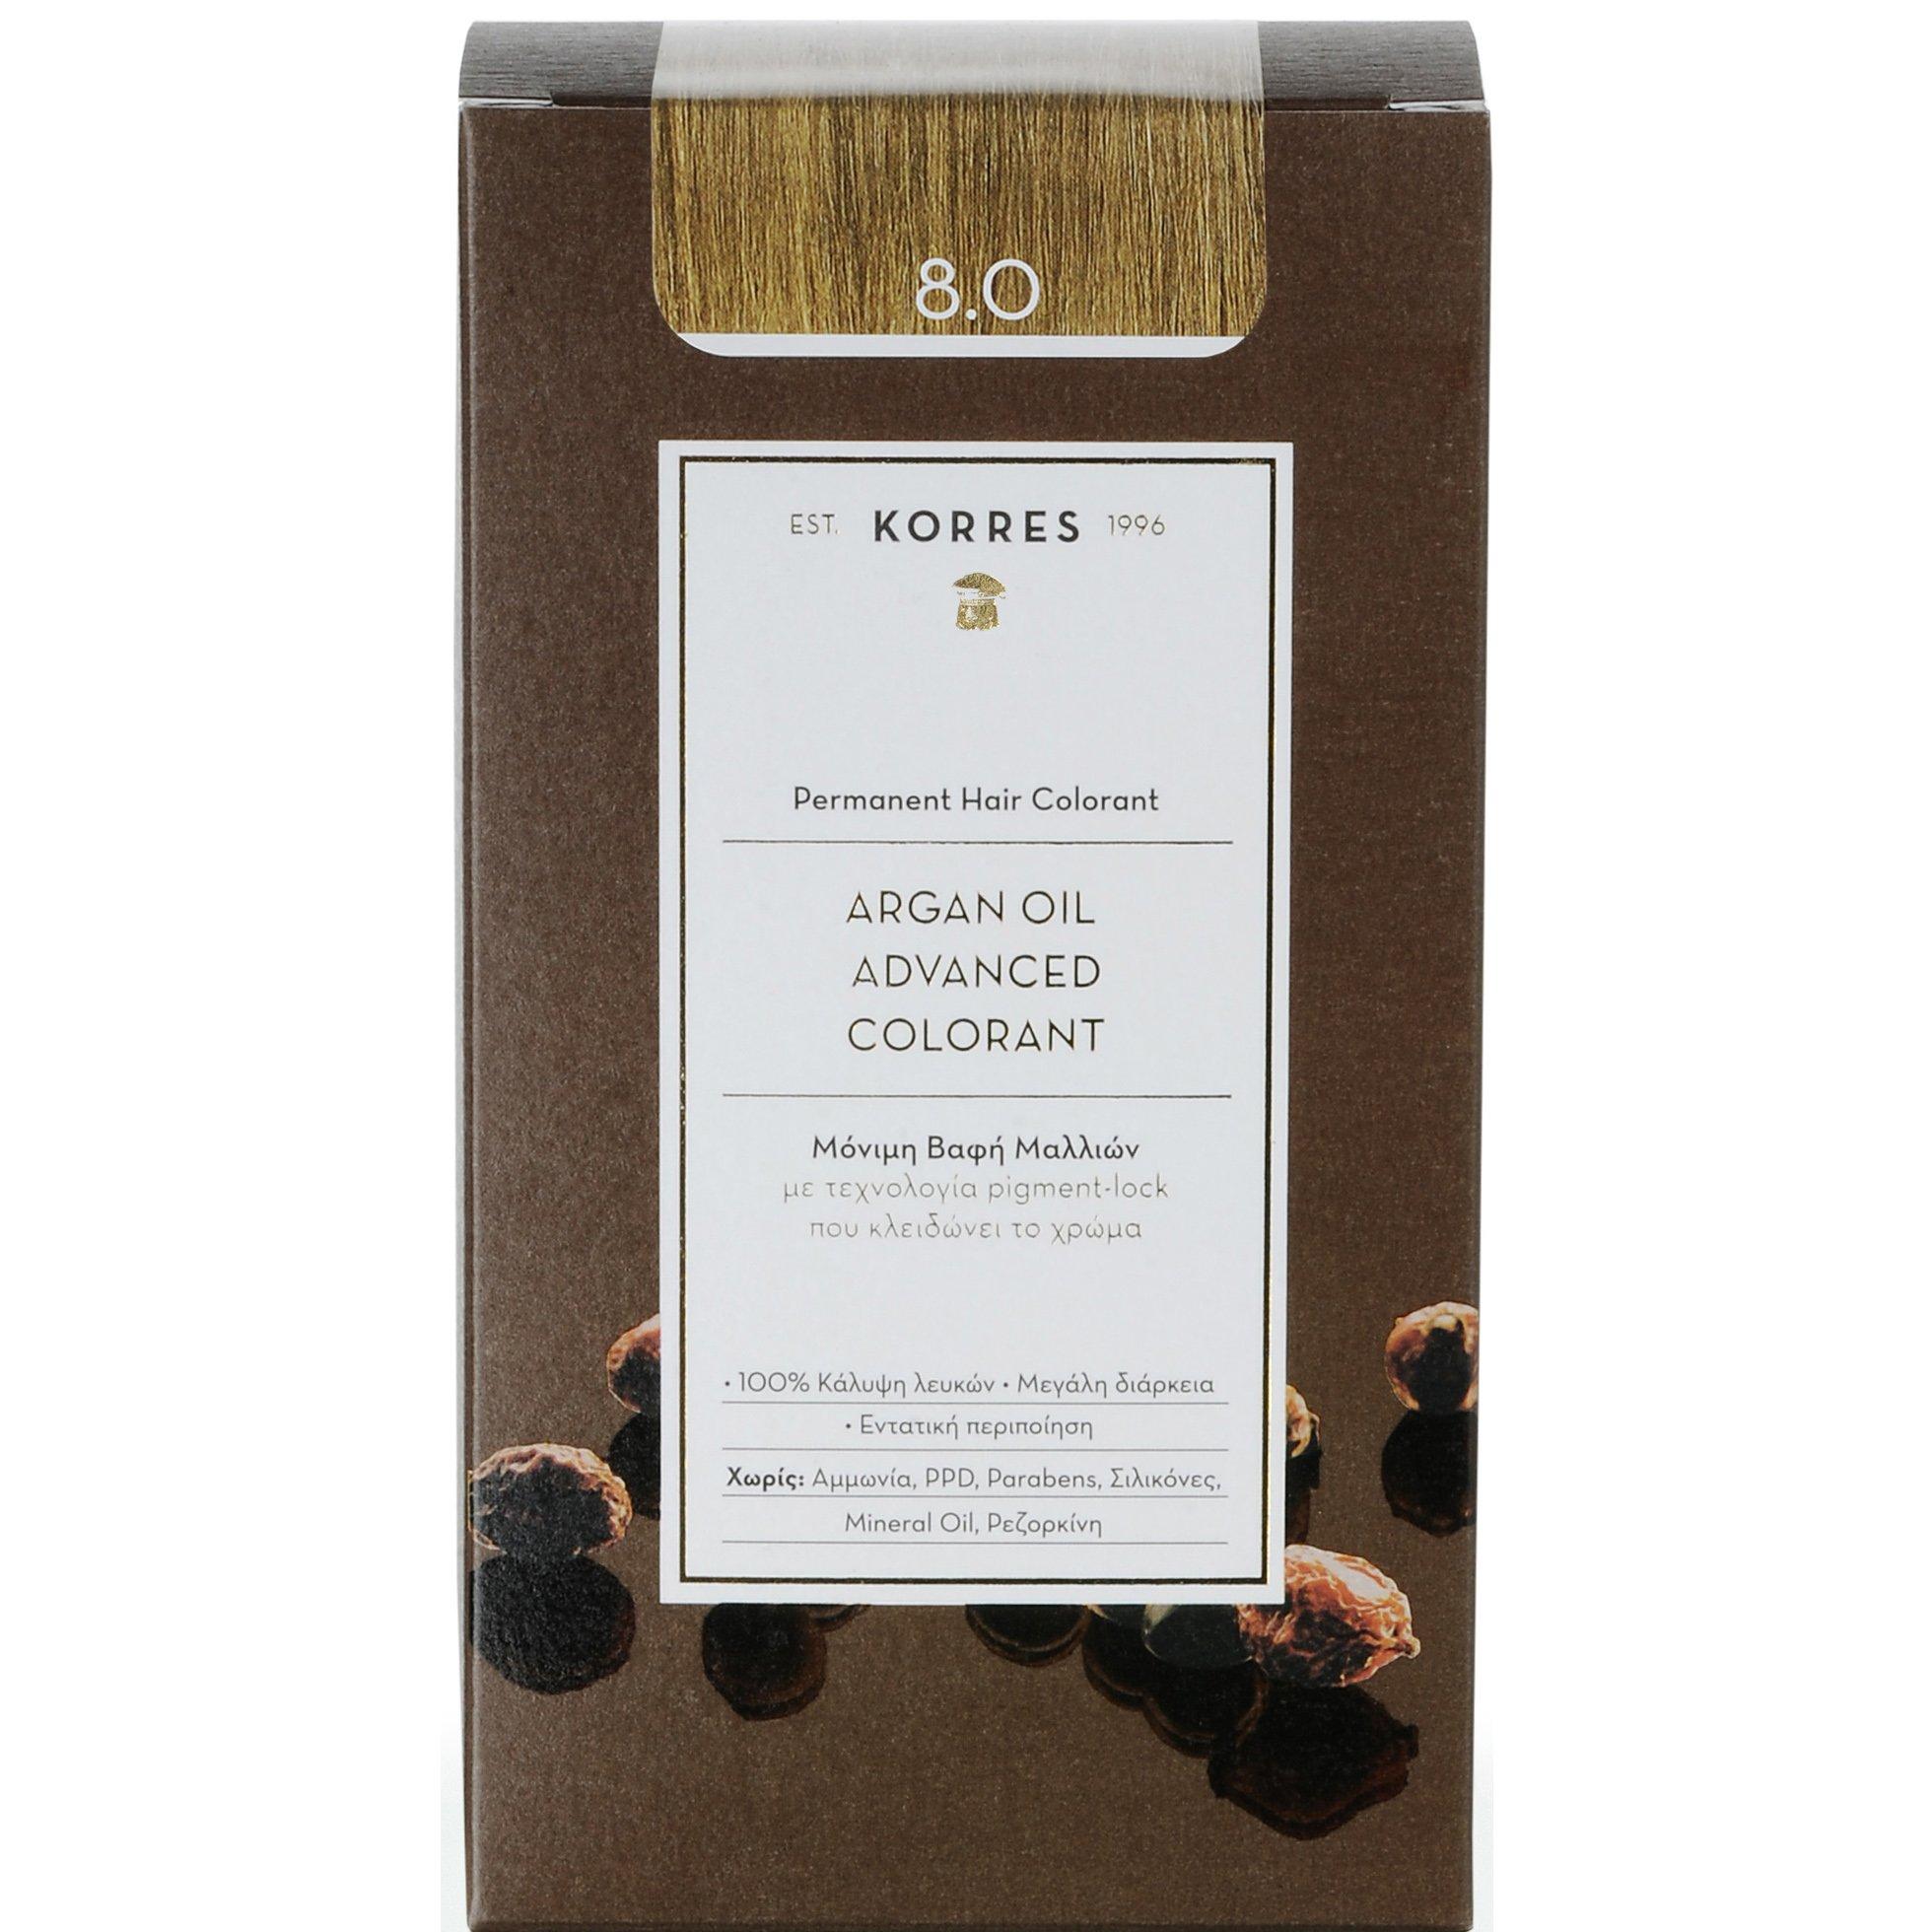 Korres Argan Oil Advanced Colorant Μόνιμη Βαφή Μαλλιών με Τεχνολογία Pigment-Lock που Κλειδώνει το Χρώμα 50ml – 8.0 ΞΑΝΘΟ ΑΝΟΙΧΤΟ ΦΥΣΙΚΟ